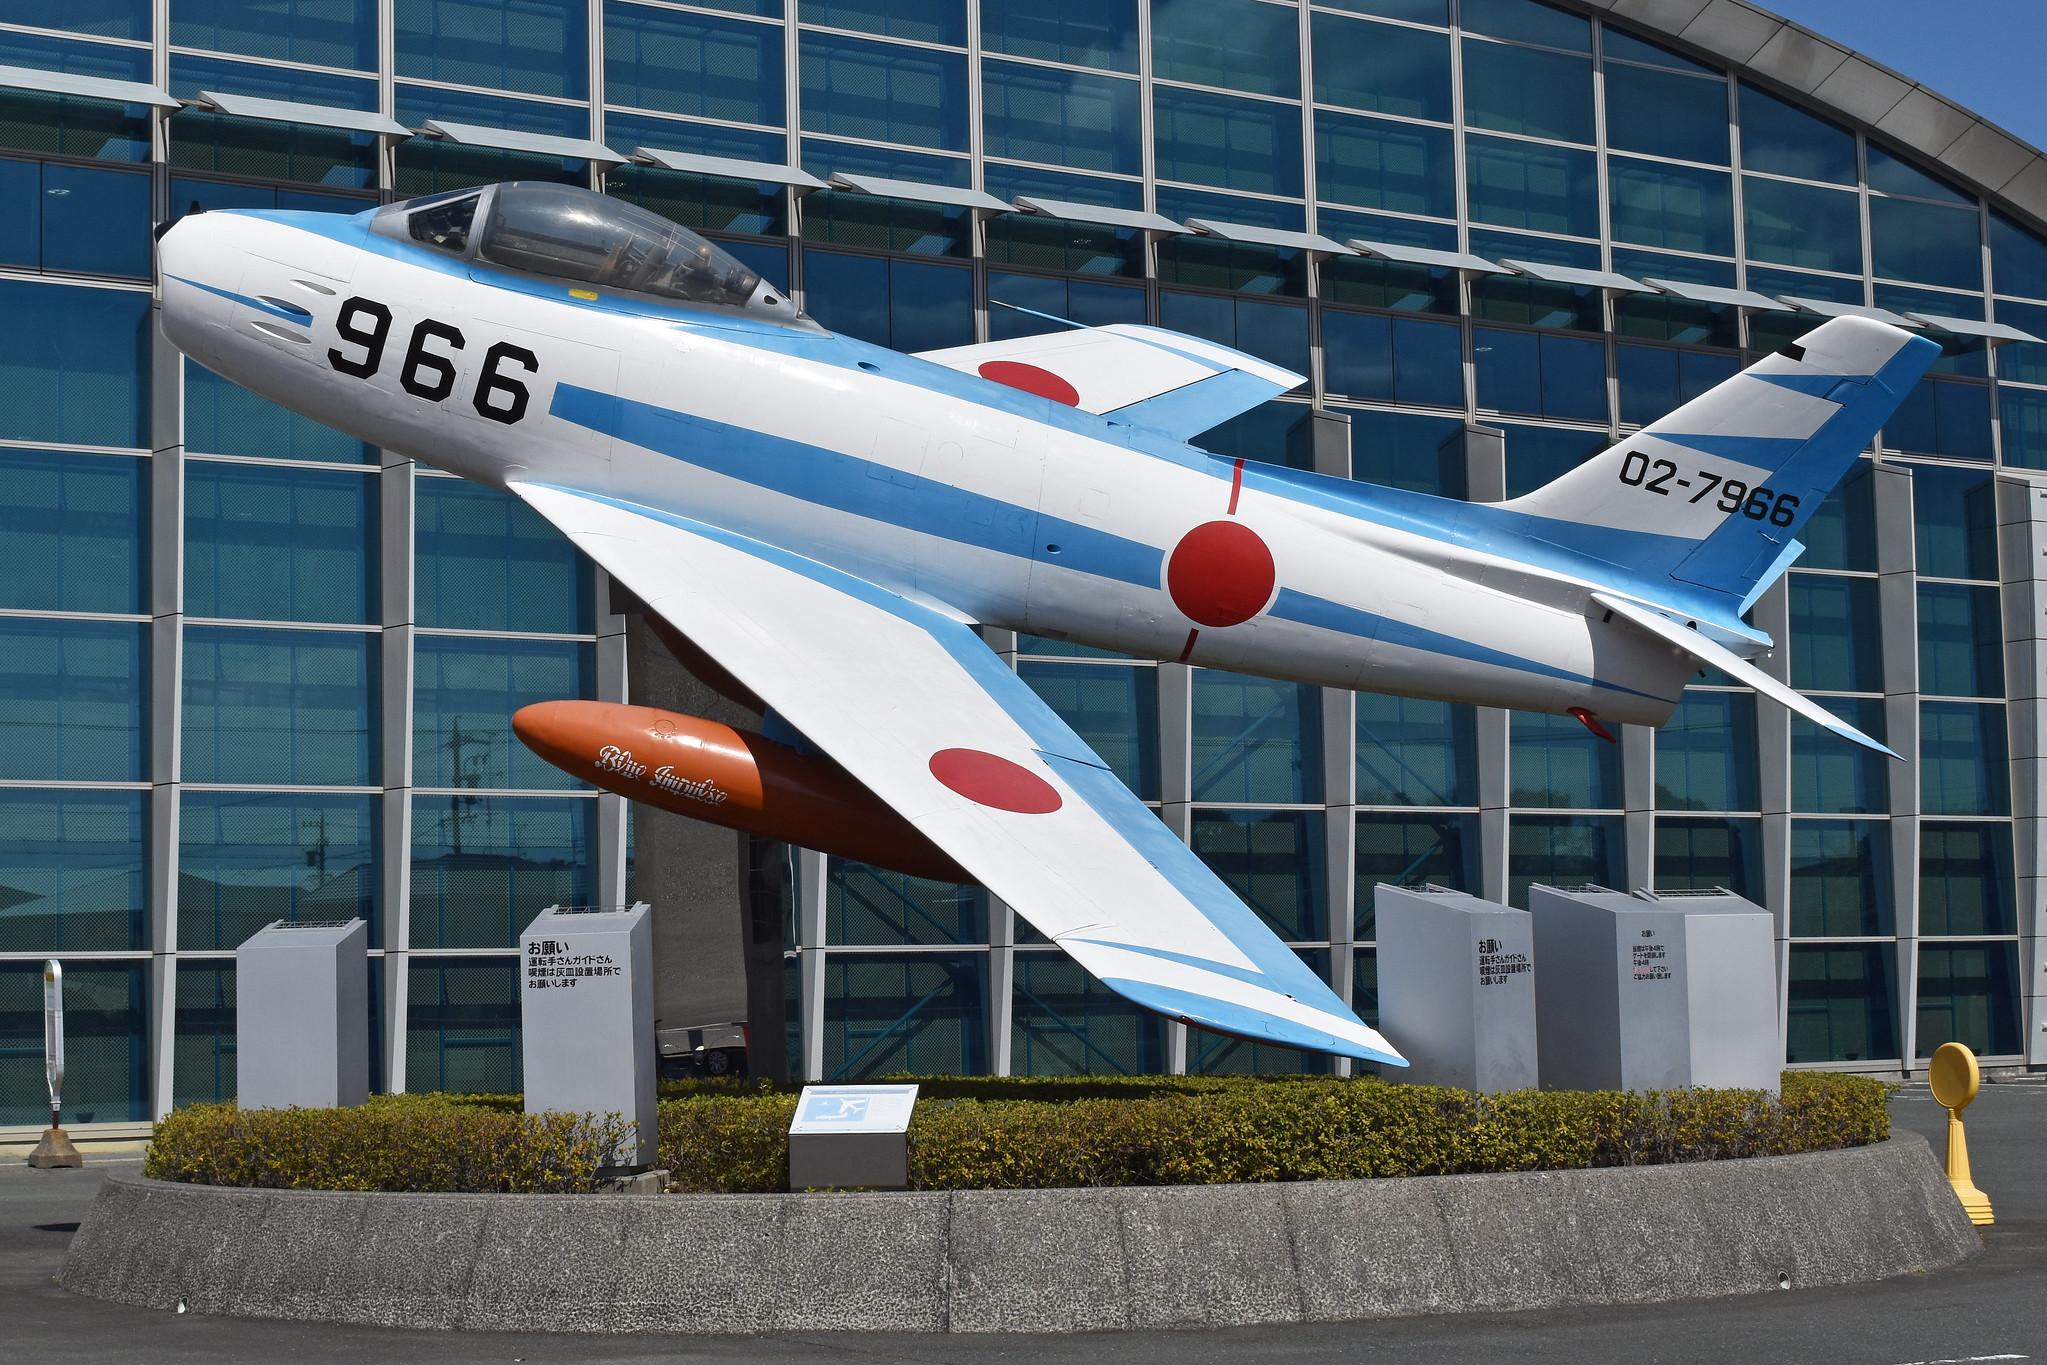 North American F-86F Sabre '02-7966 / 966'